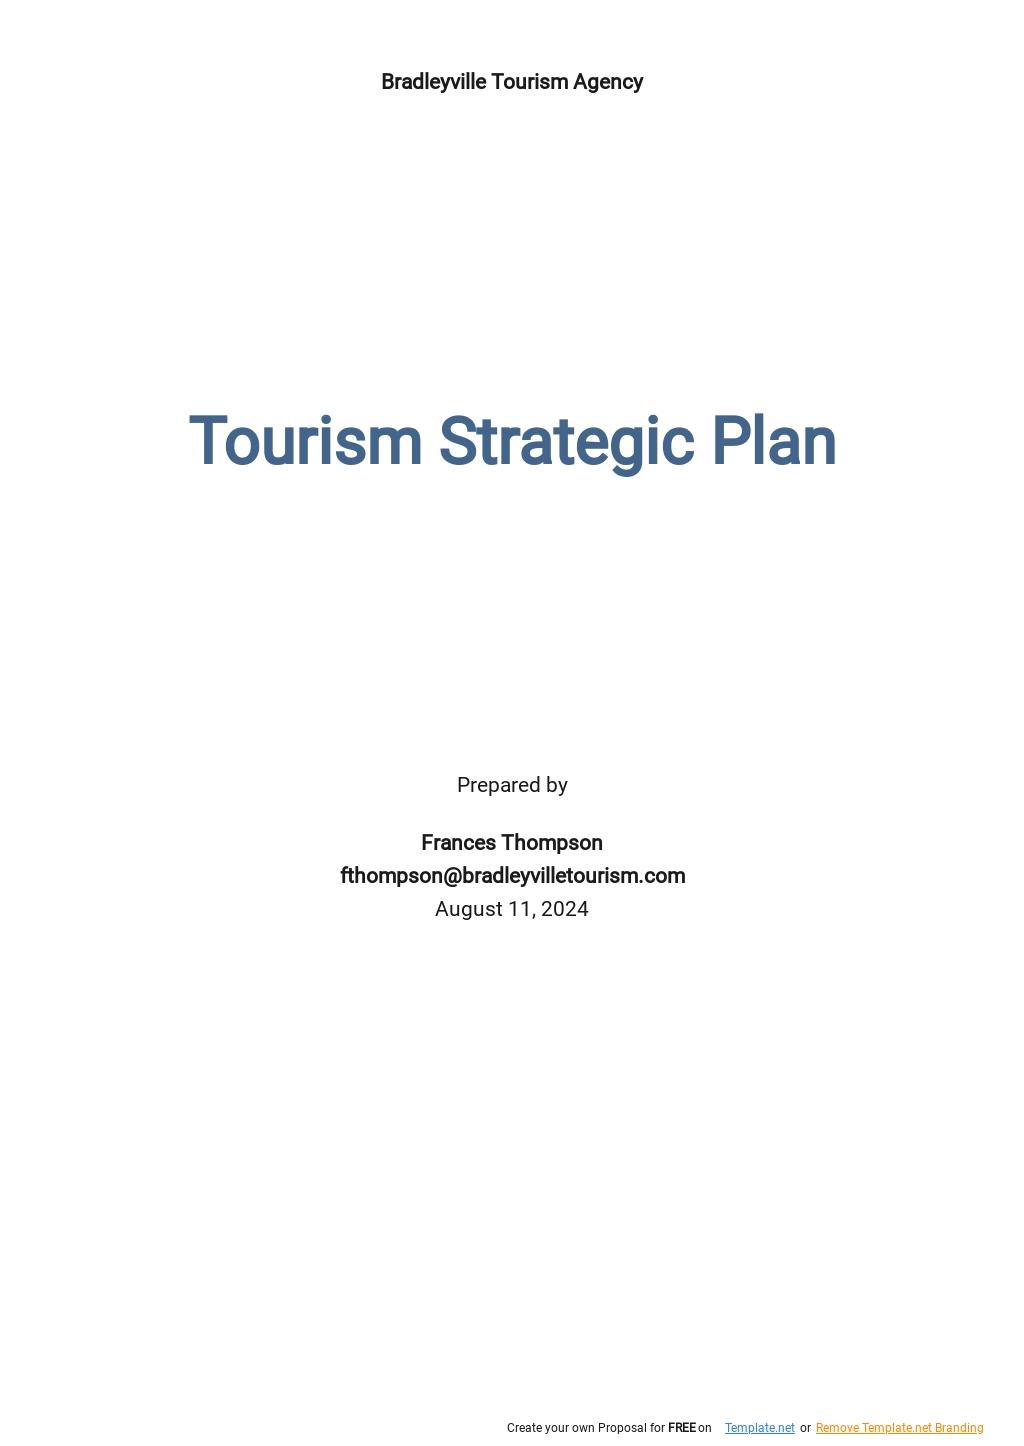 Tourism Strategic Plan Template.jpe